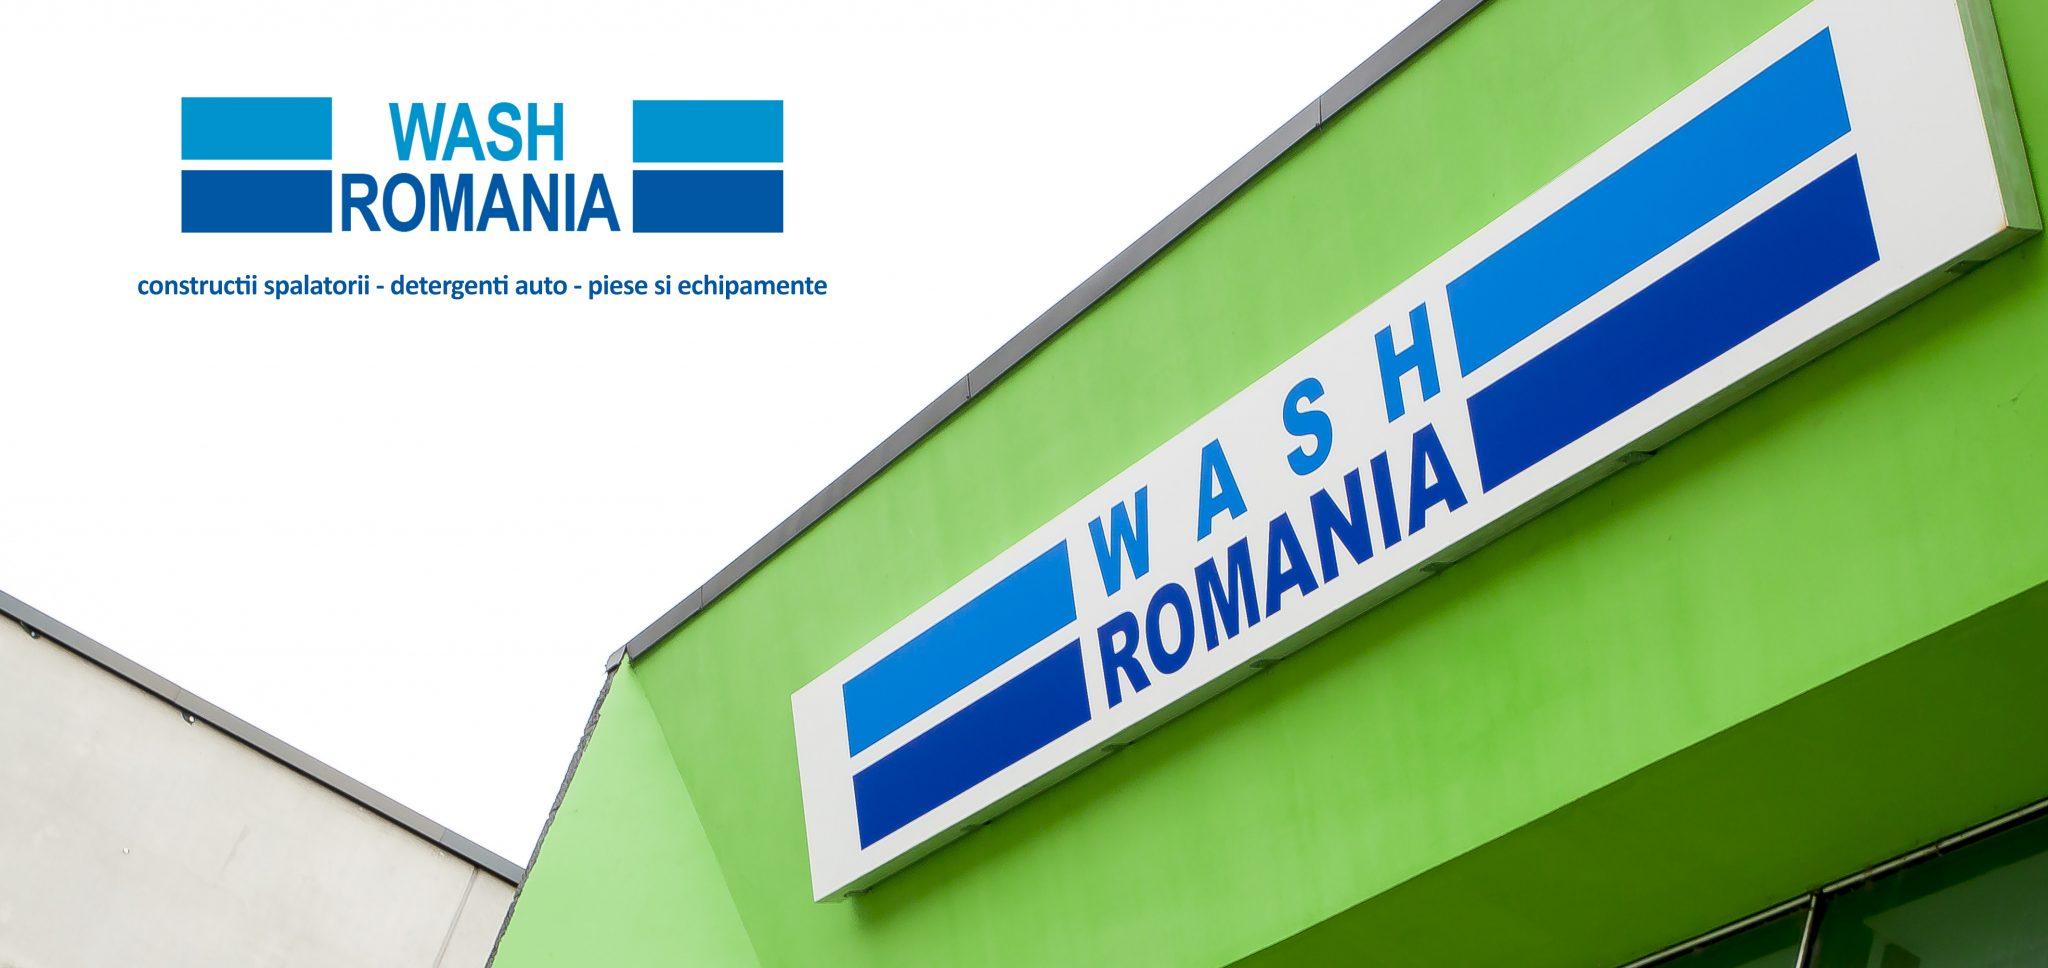 WashRomania constructii spalatorii detergenti piese